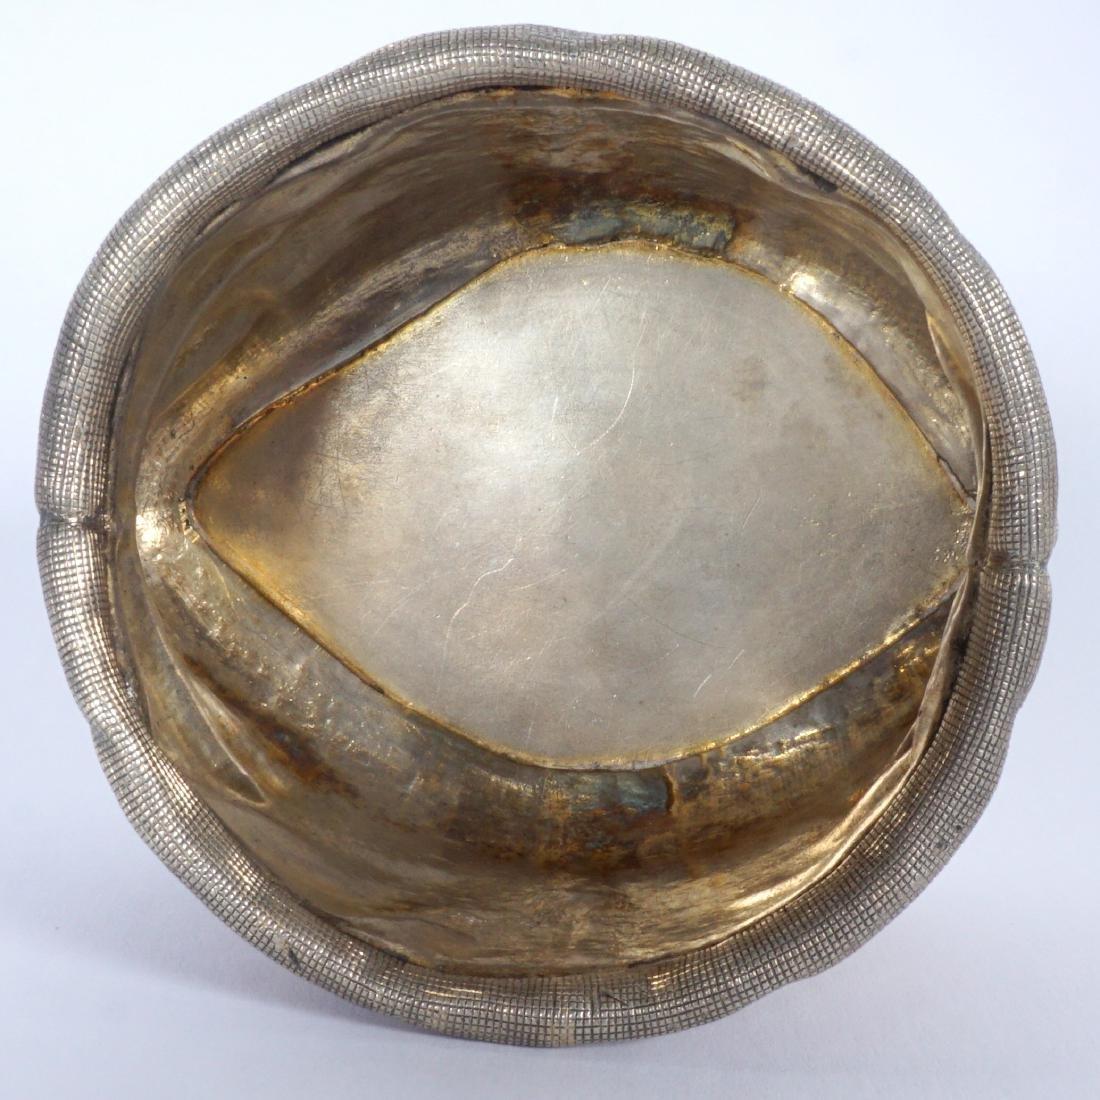 Russian Silver Trompe L'oeil Bag - 5